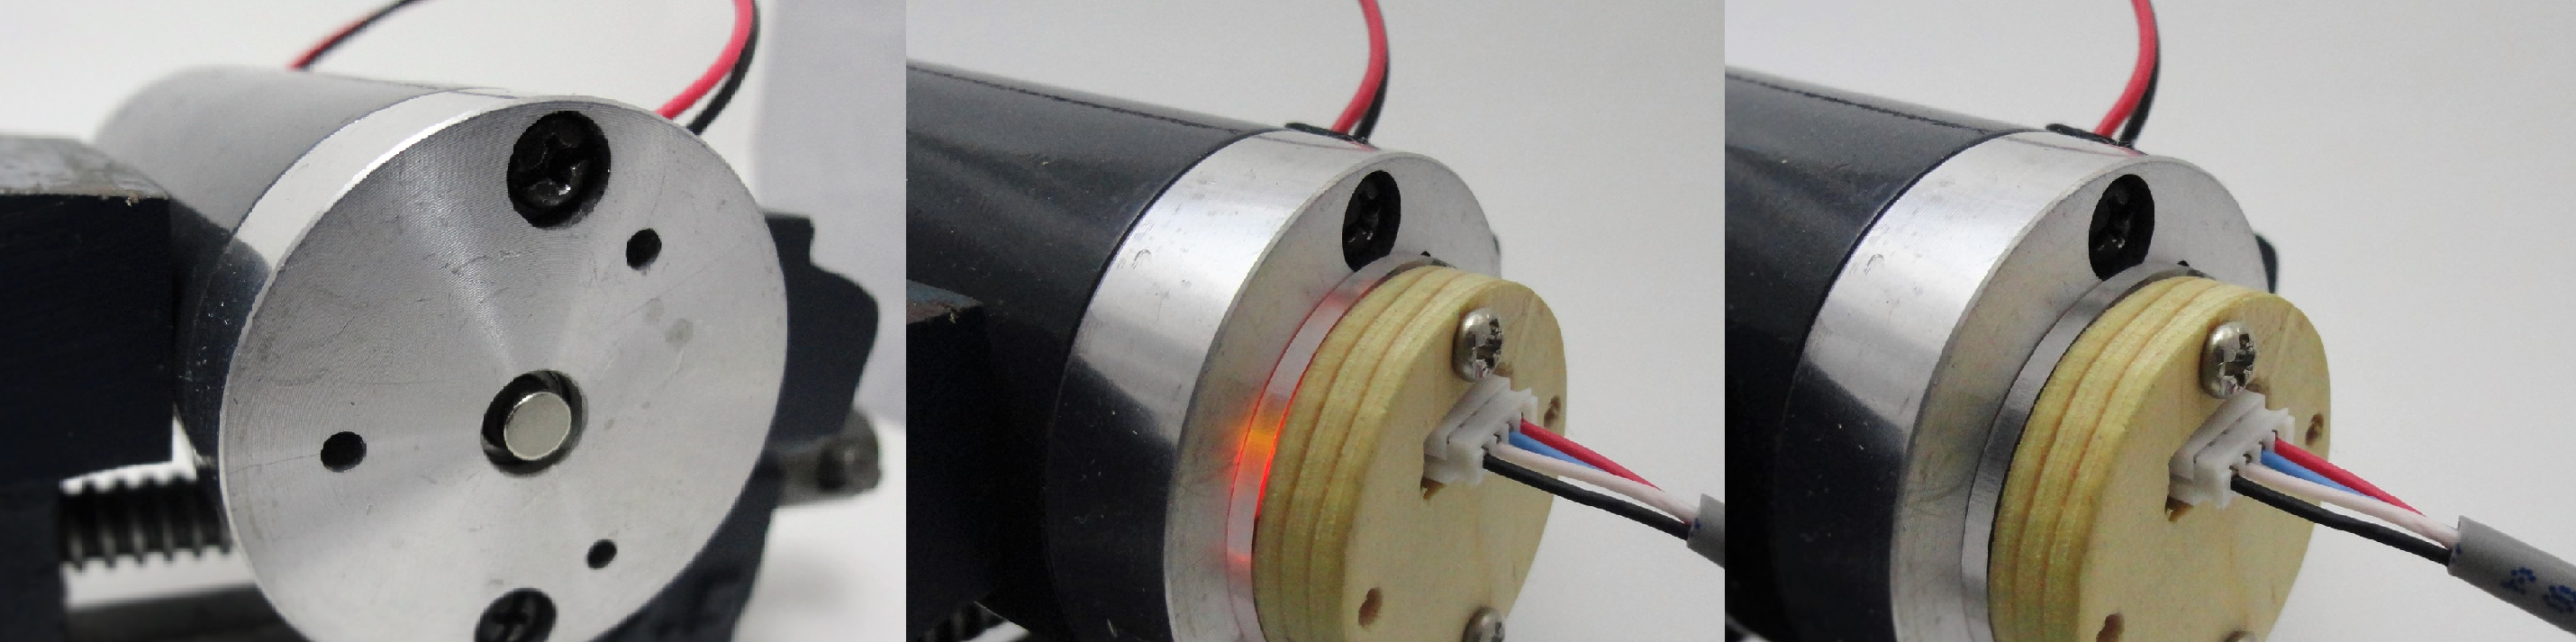 Magnetic Incremental Rotary Encoder | Hackaday io